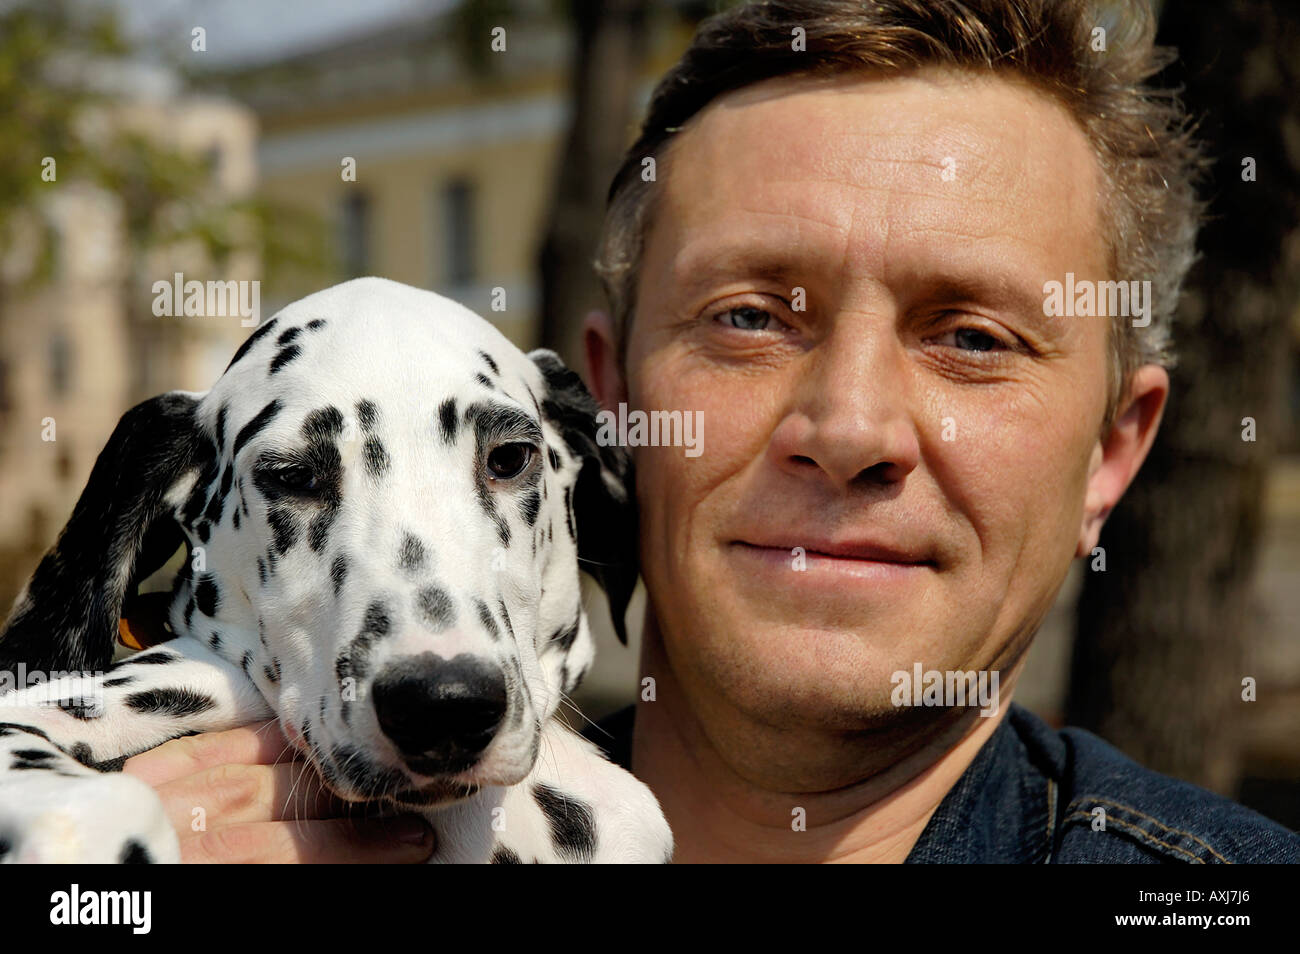 Man and a young Dalmatian dog - Stock Image